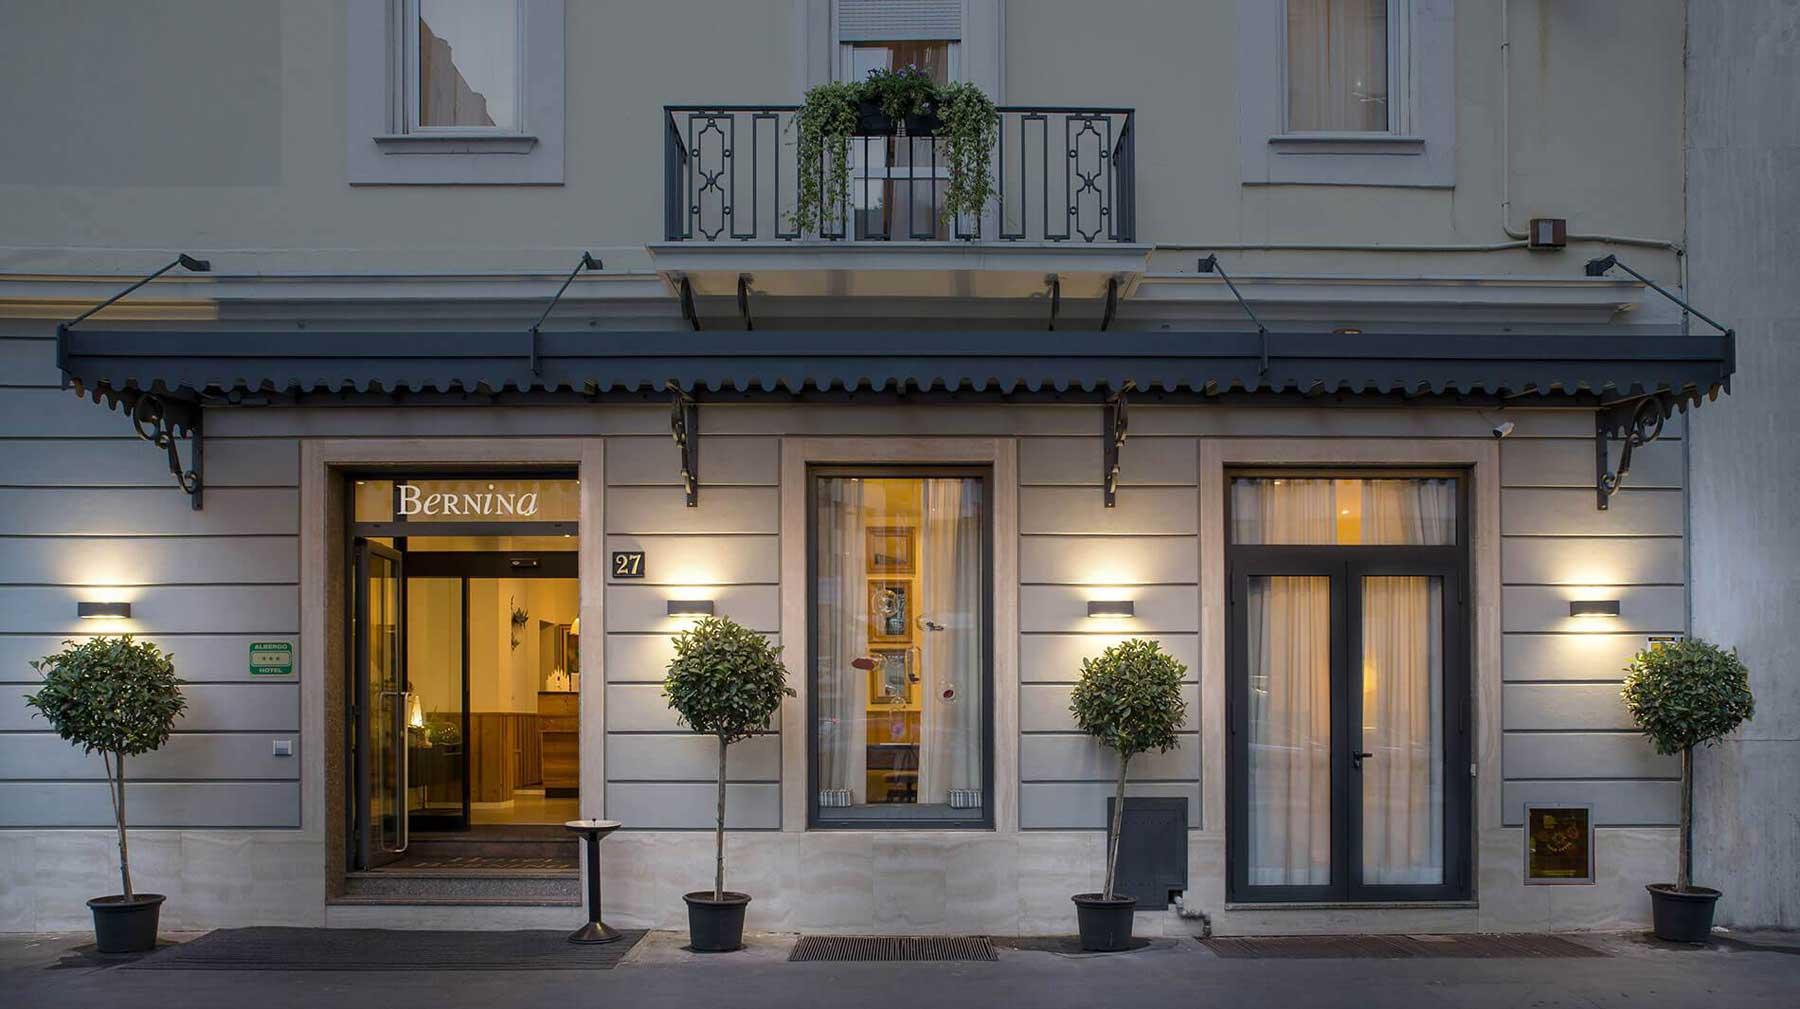 Hotel Bernina Milan, Italie : Façade de l'hotel